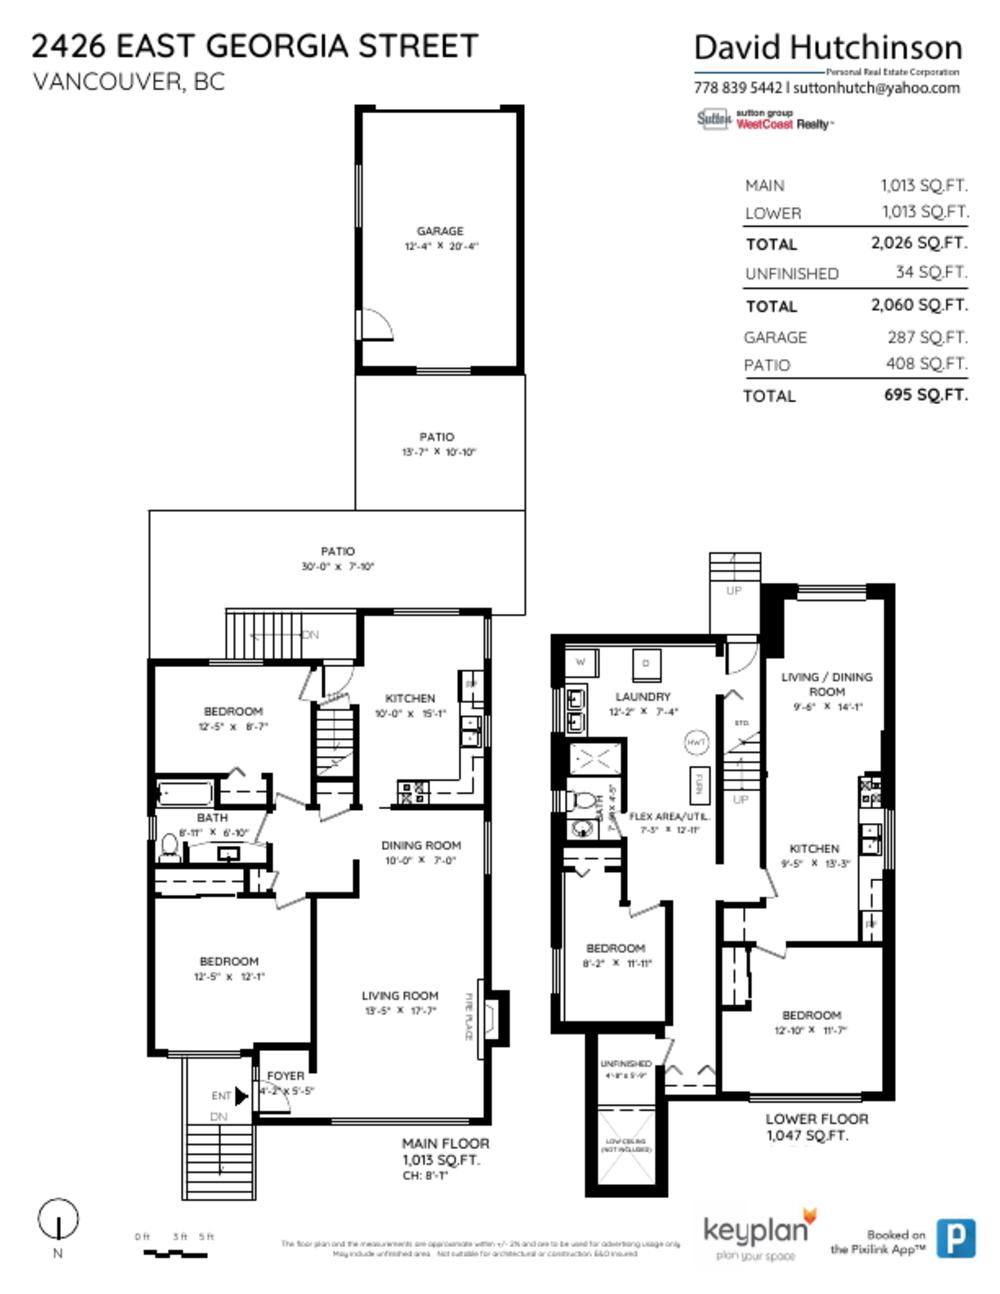 Real Estate Floor Plans Pixilink Solutions